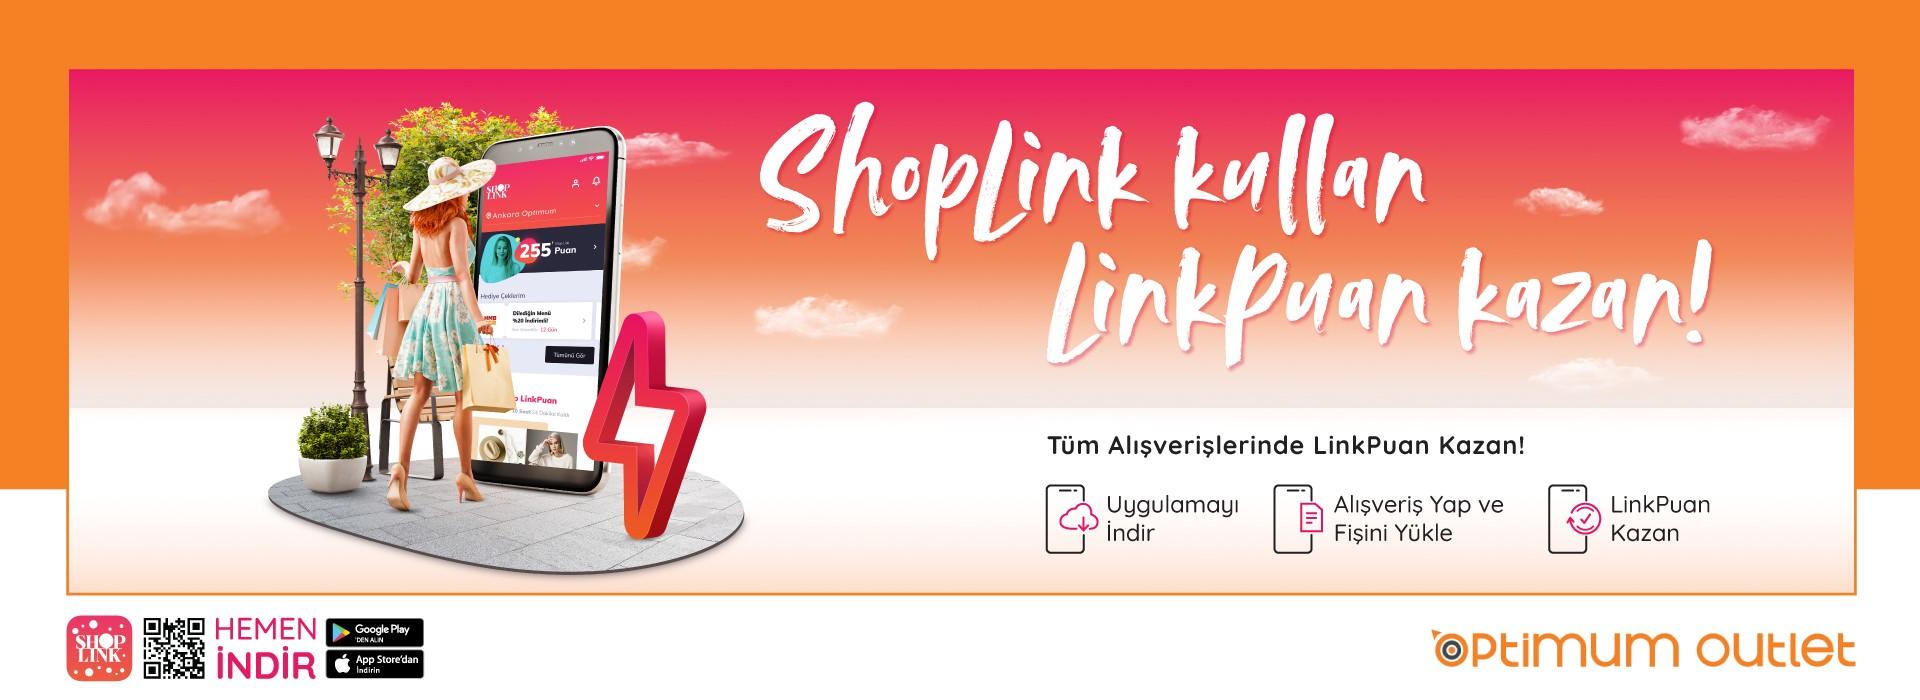 ShopLink Kullan LinkPuan Kazan